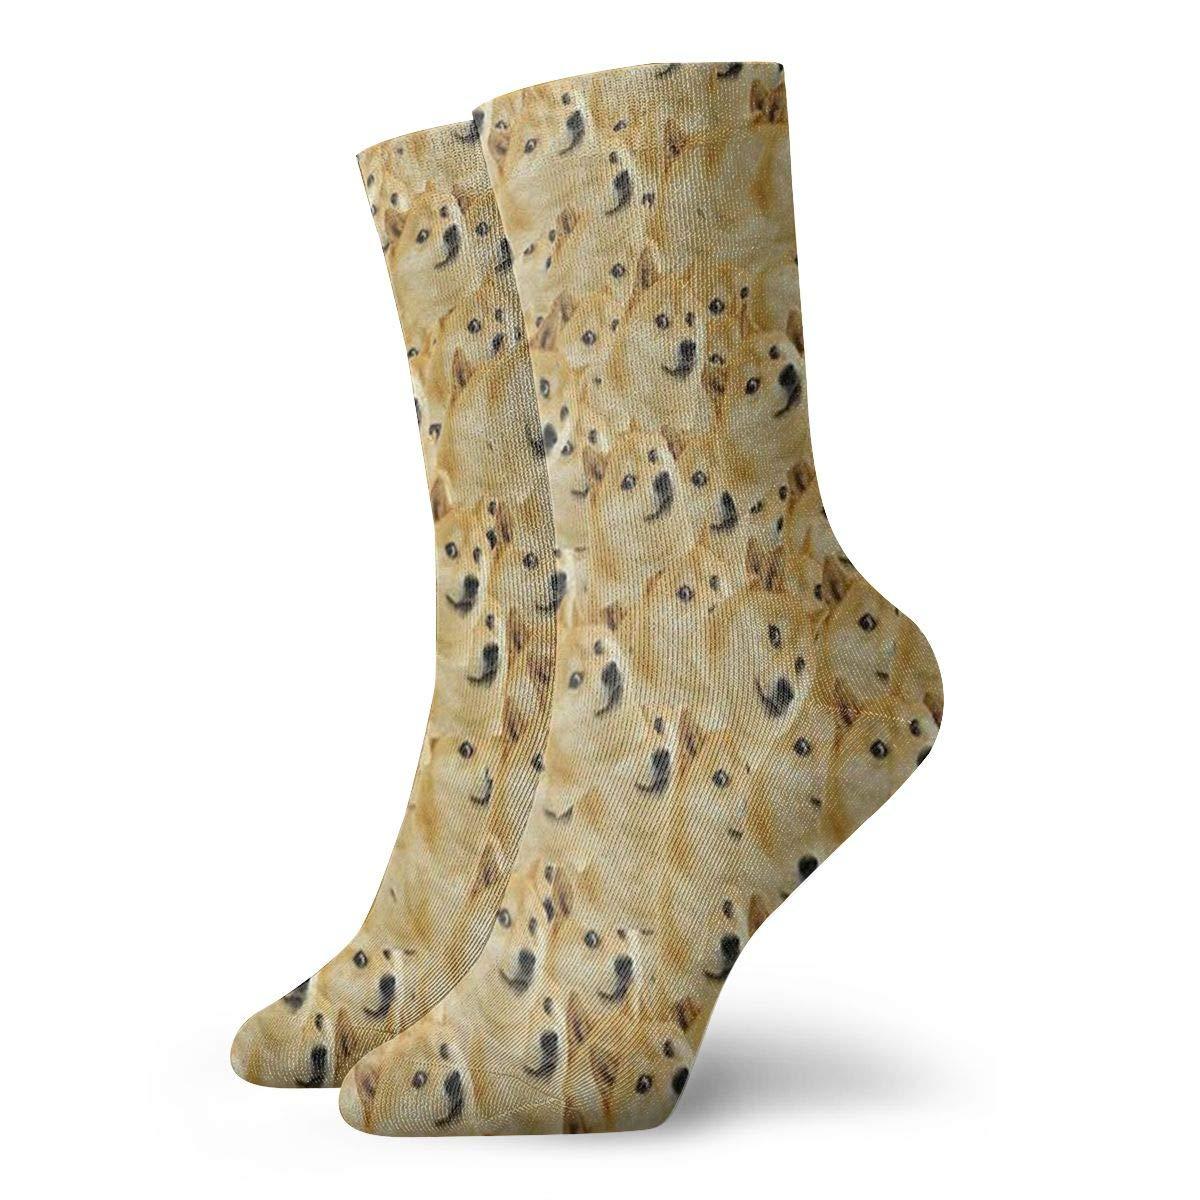 BeDoge Unisex Funny Casual Crew Socks Athletic Socks For Boys Girls Kids Teenagers